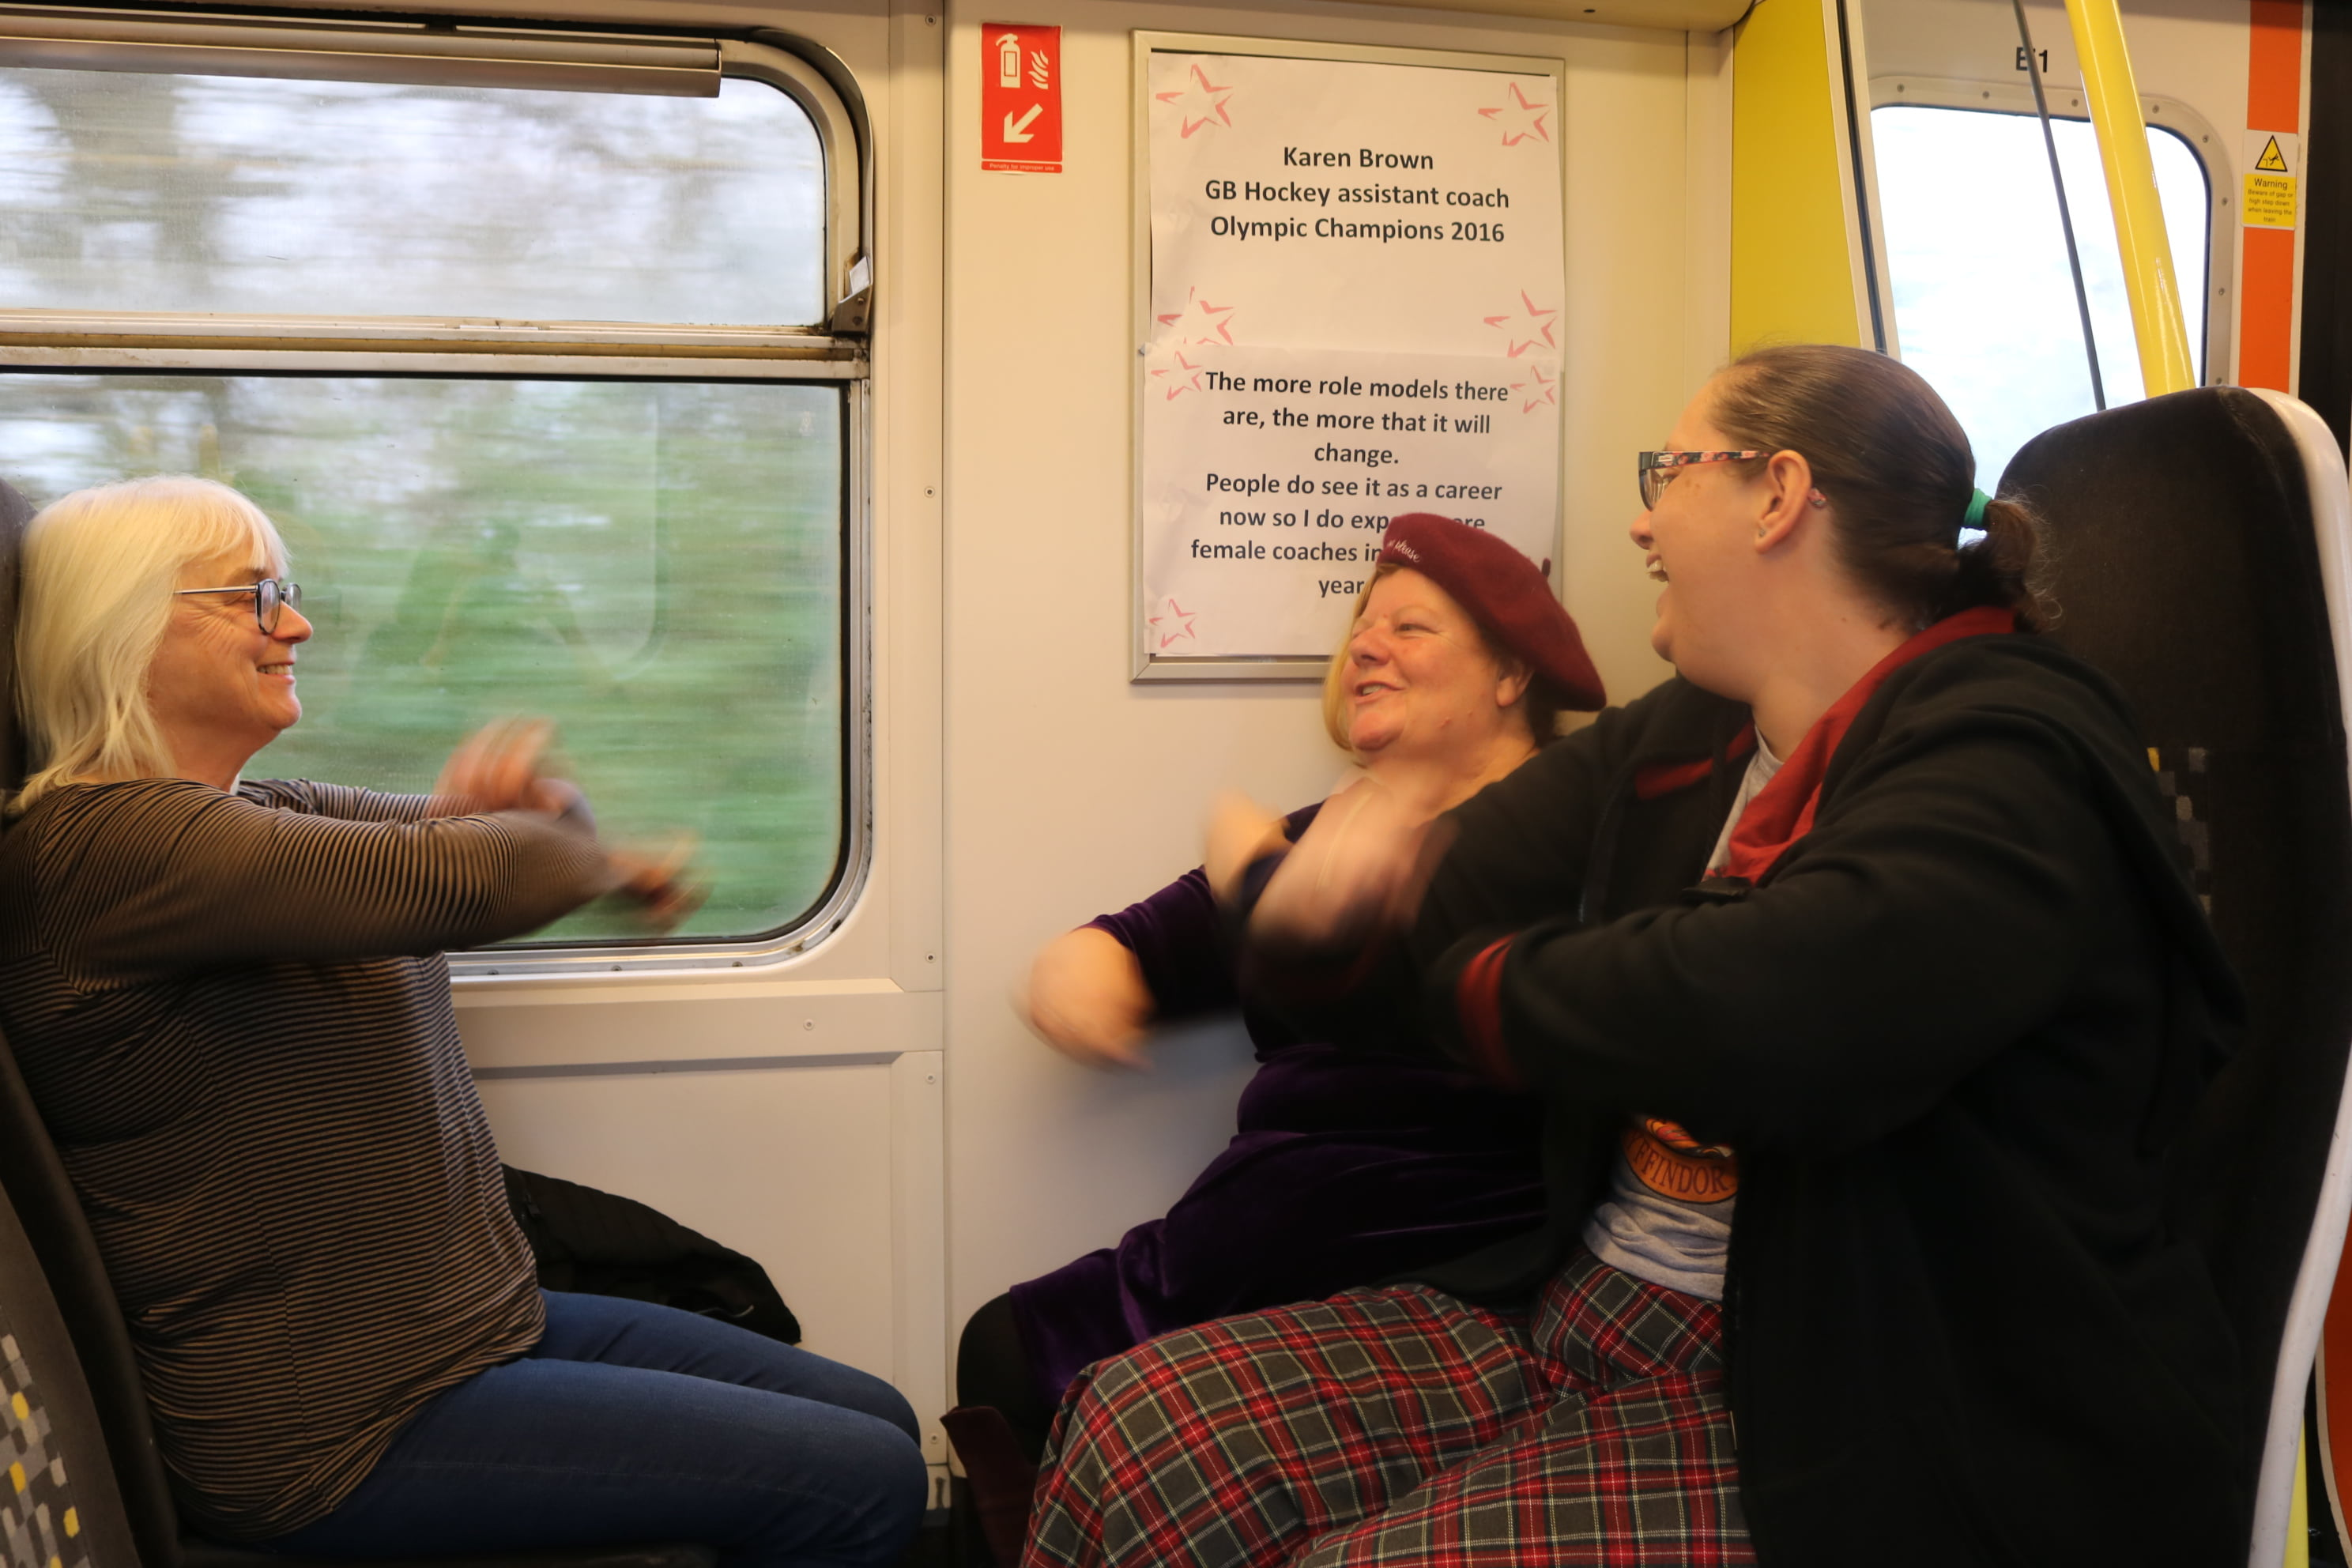 4 passengers enjoying the train workout